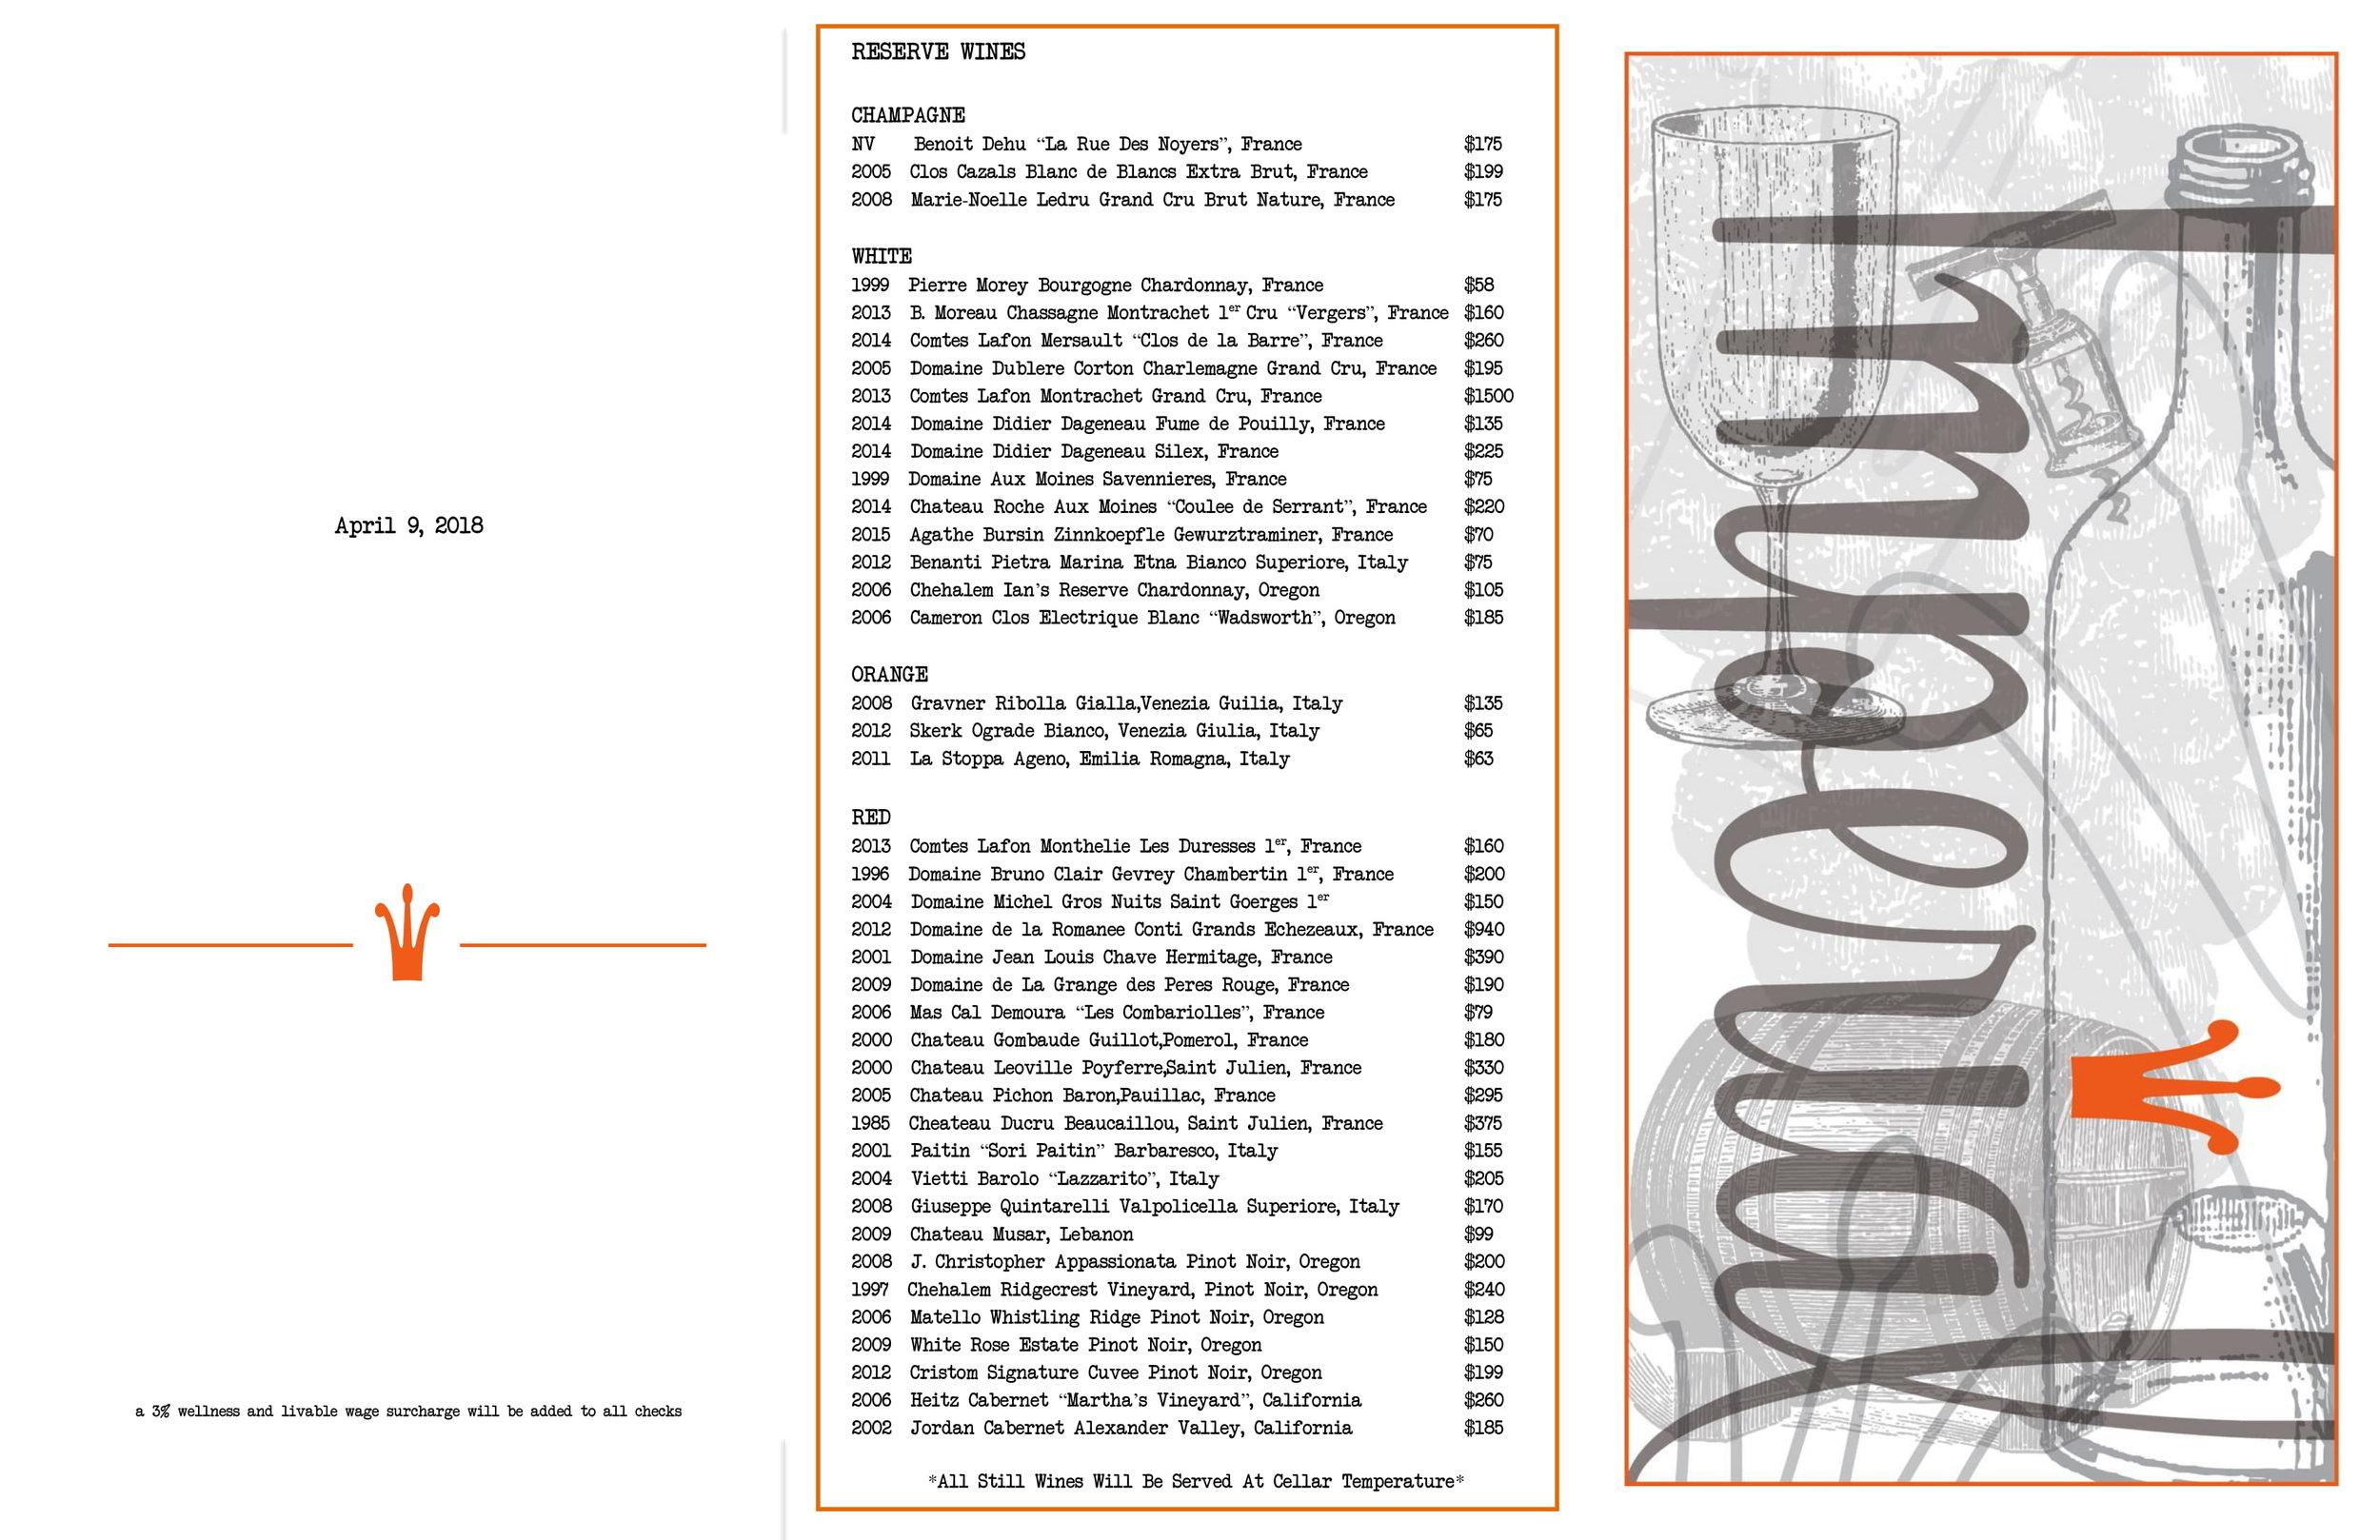 Imperial Wine List Reserve Format 4.4.18-1.jpg